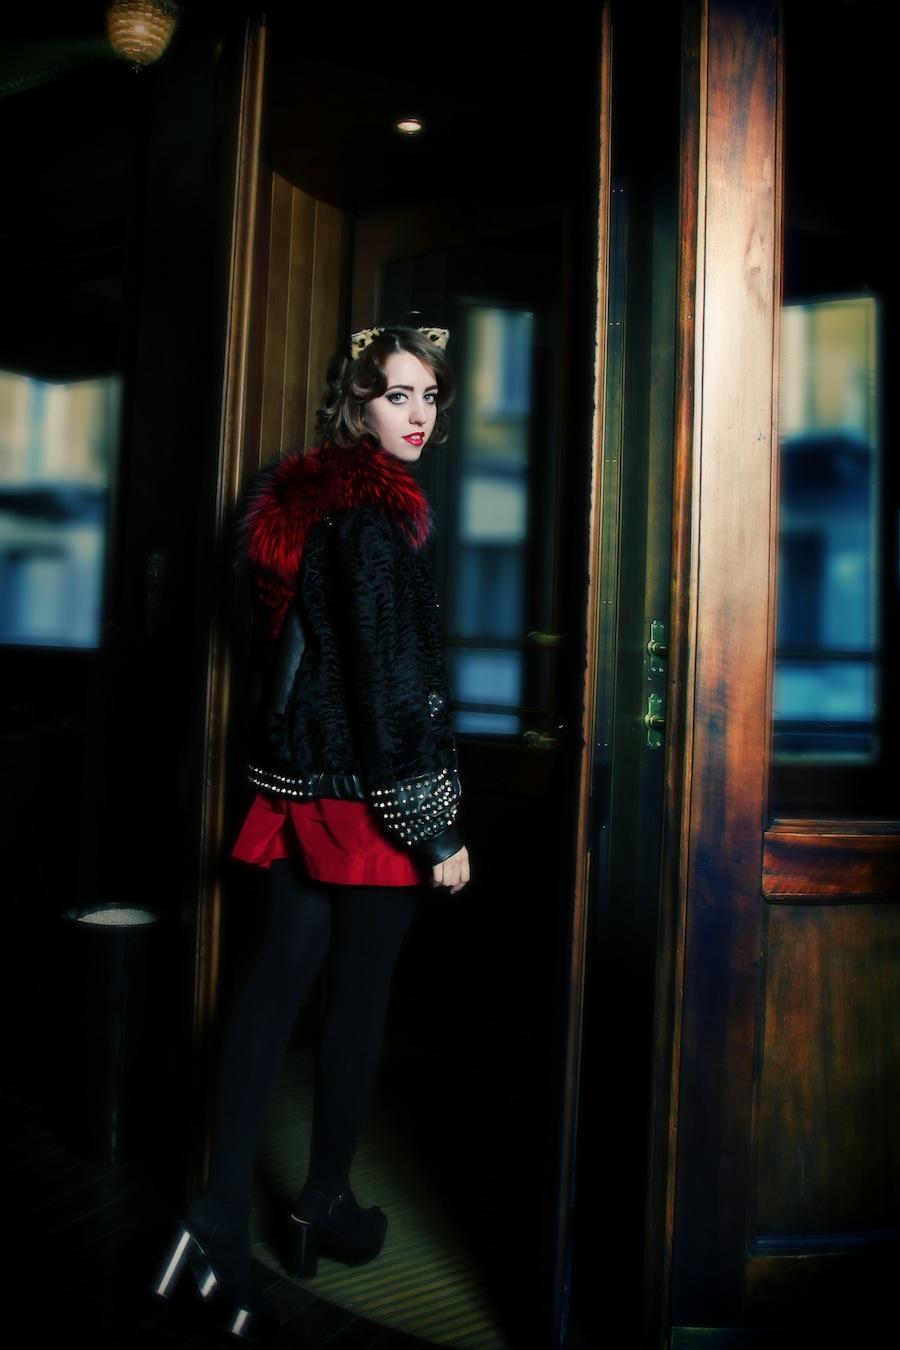 lady_fur_coat